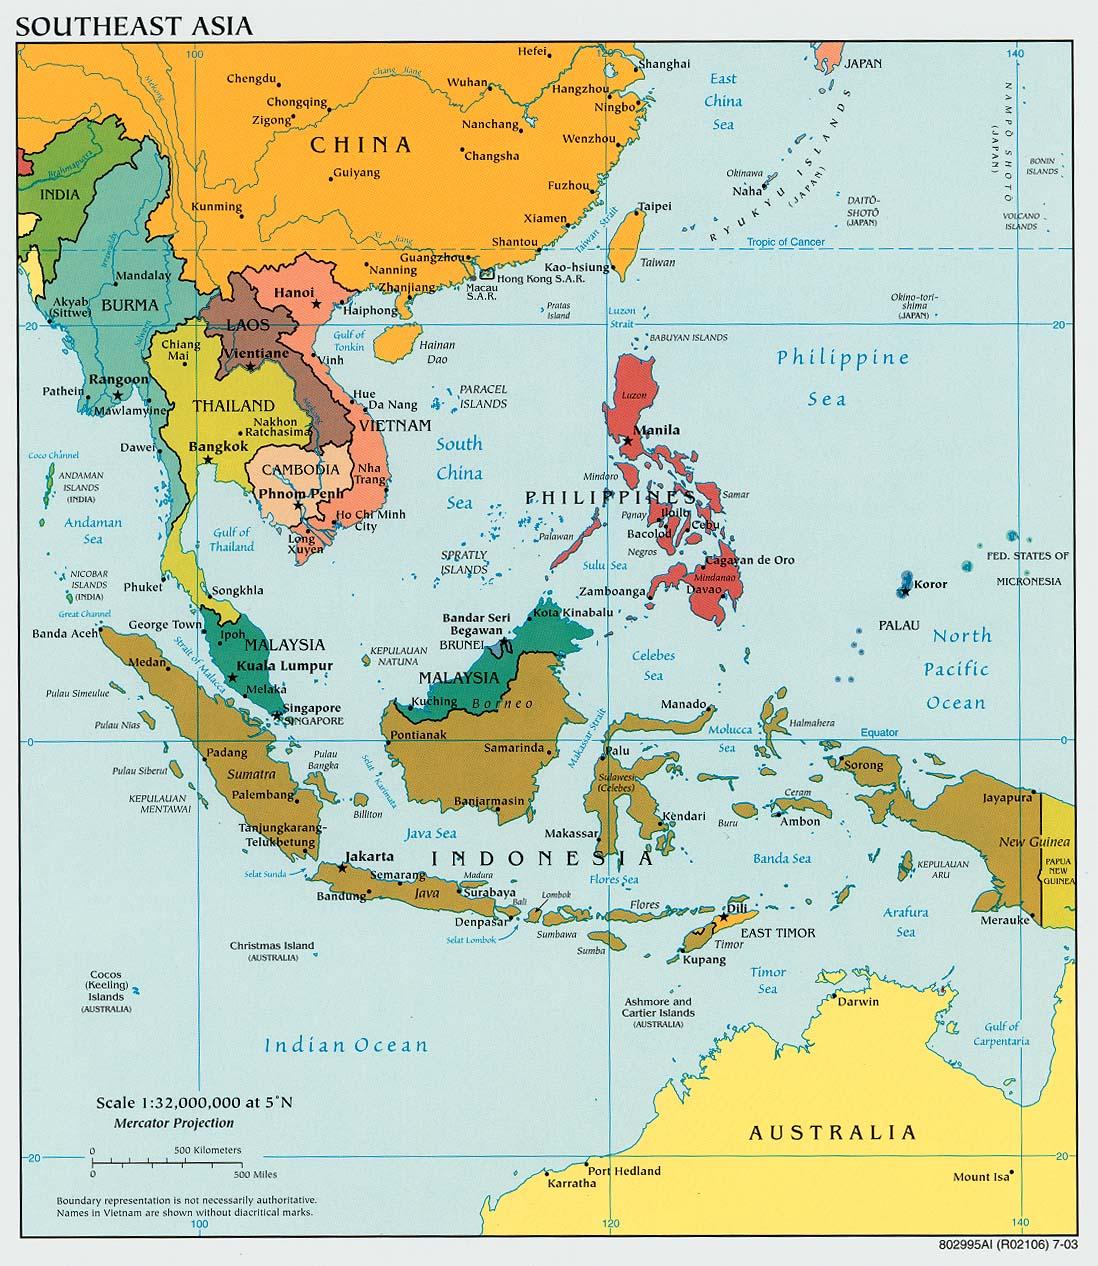 ASEAN region